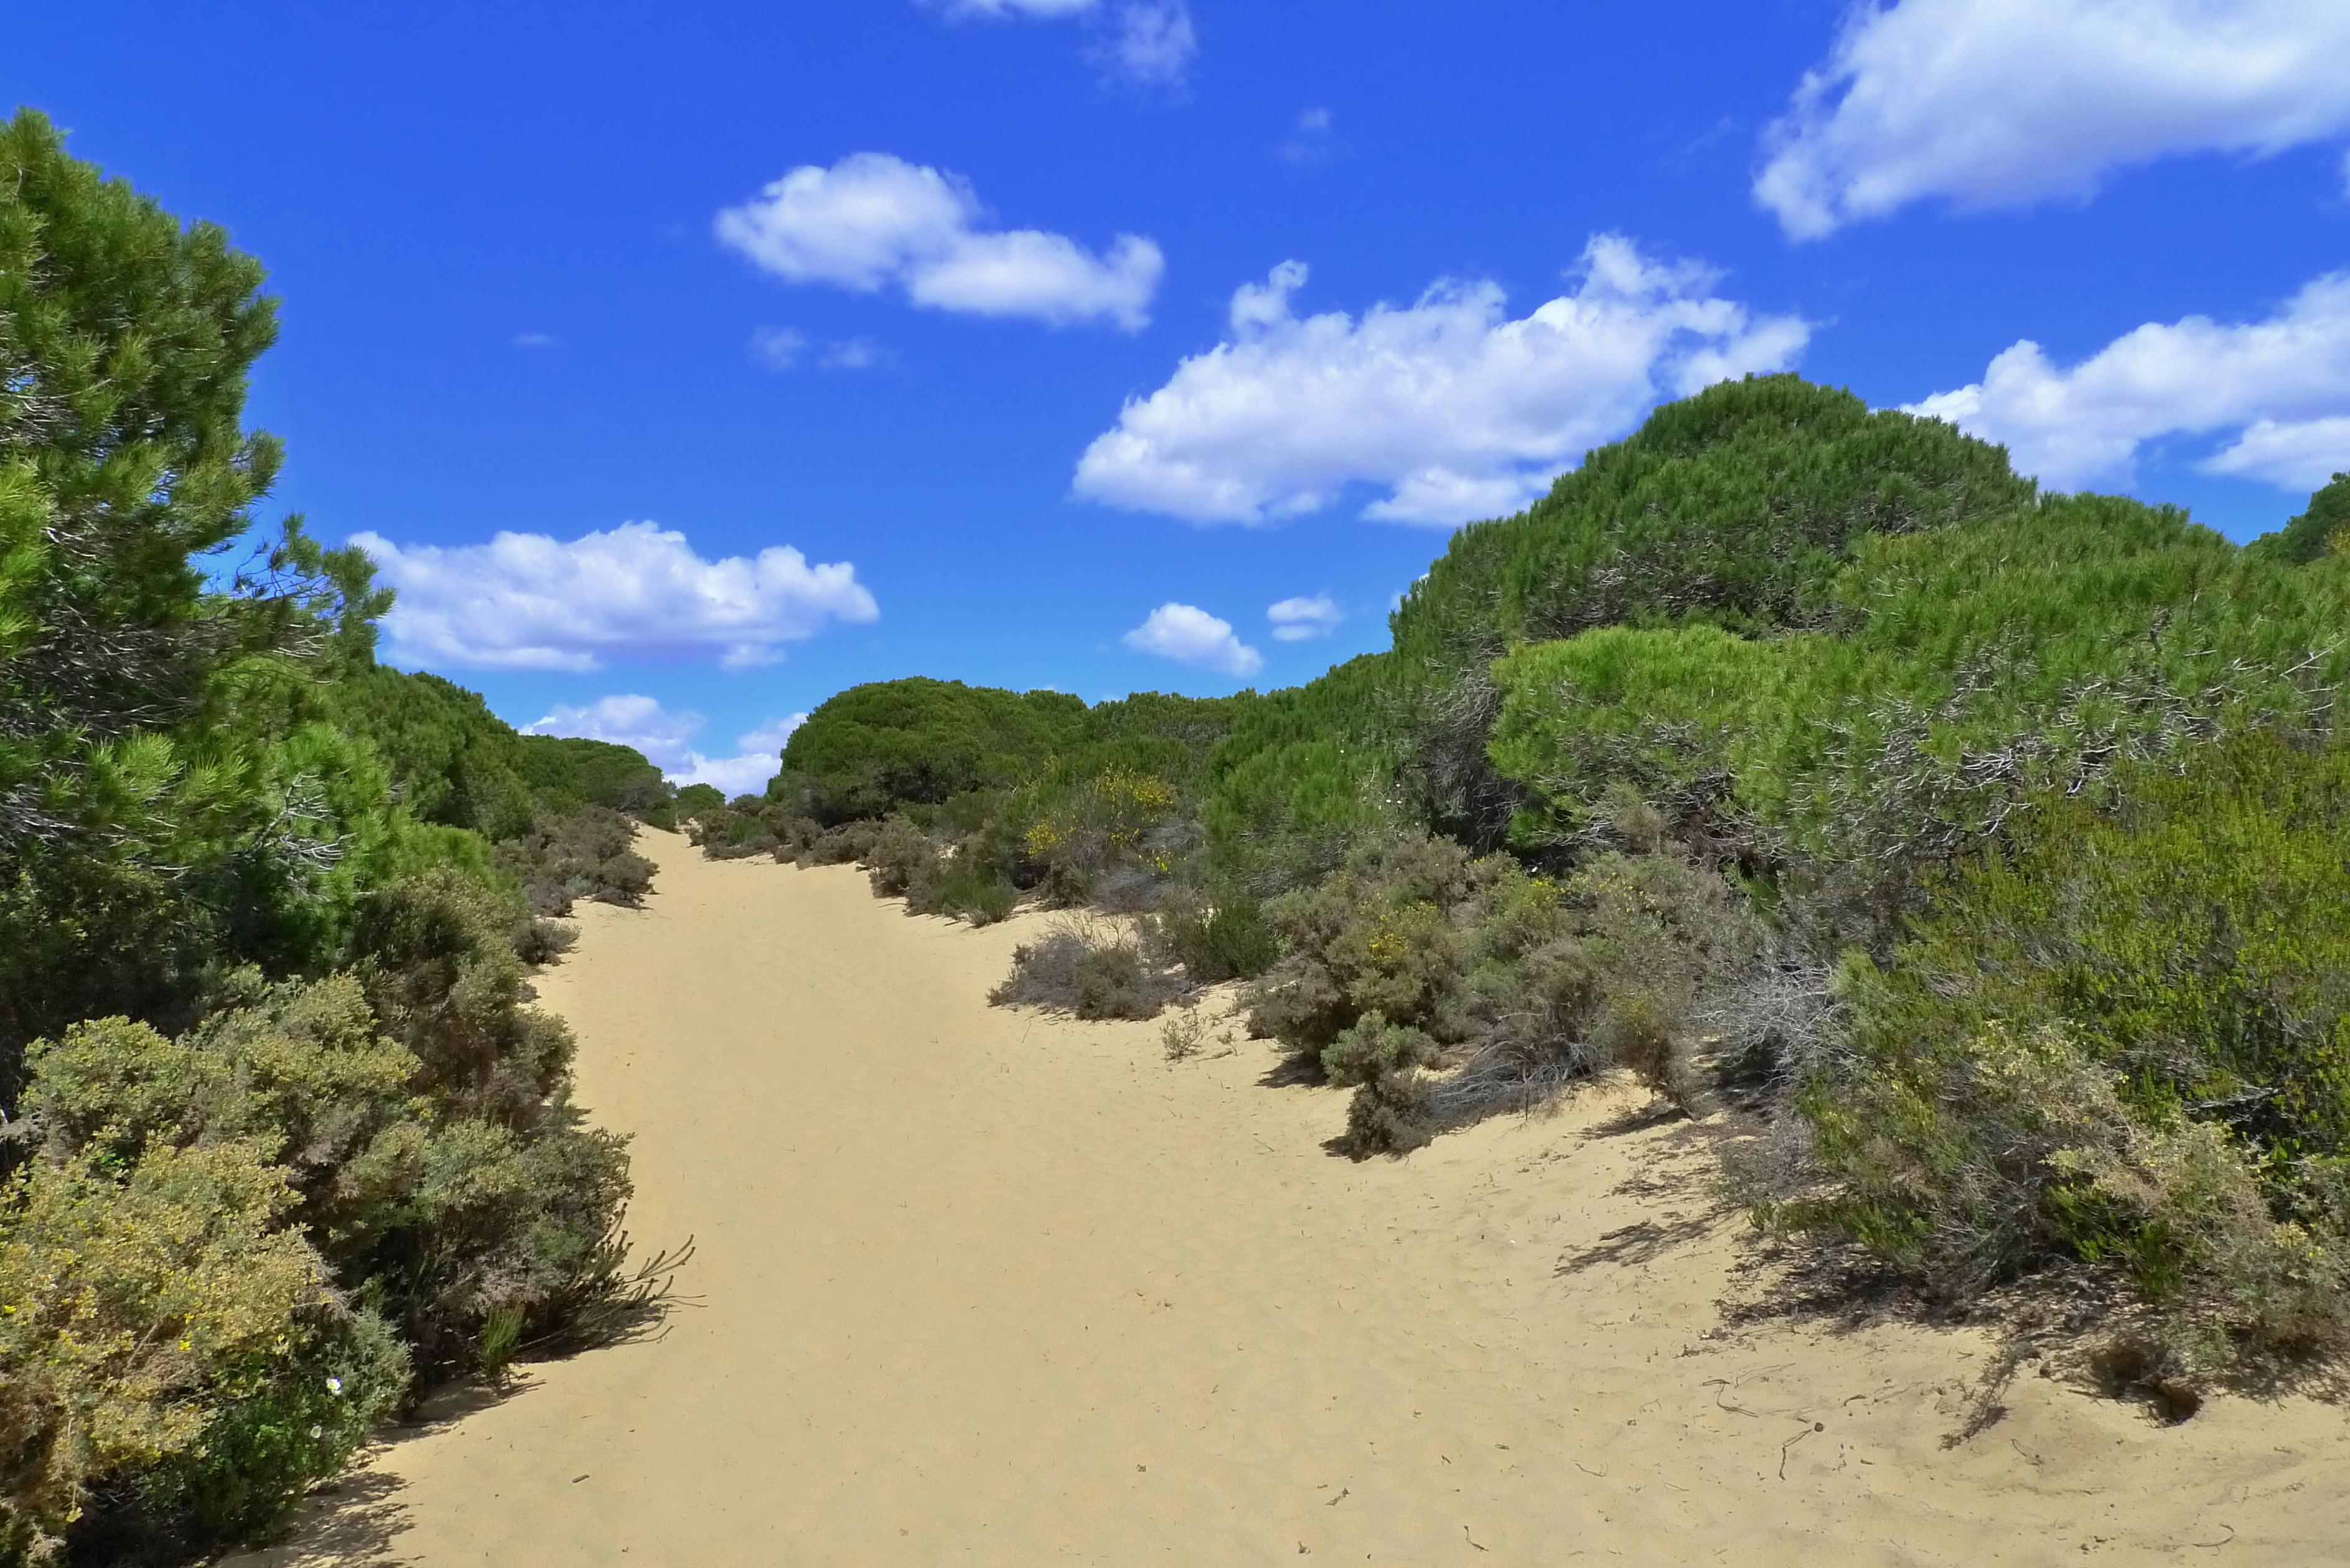 File:Pinus pinea Doñana 2.jpg